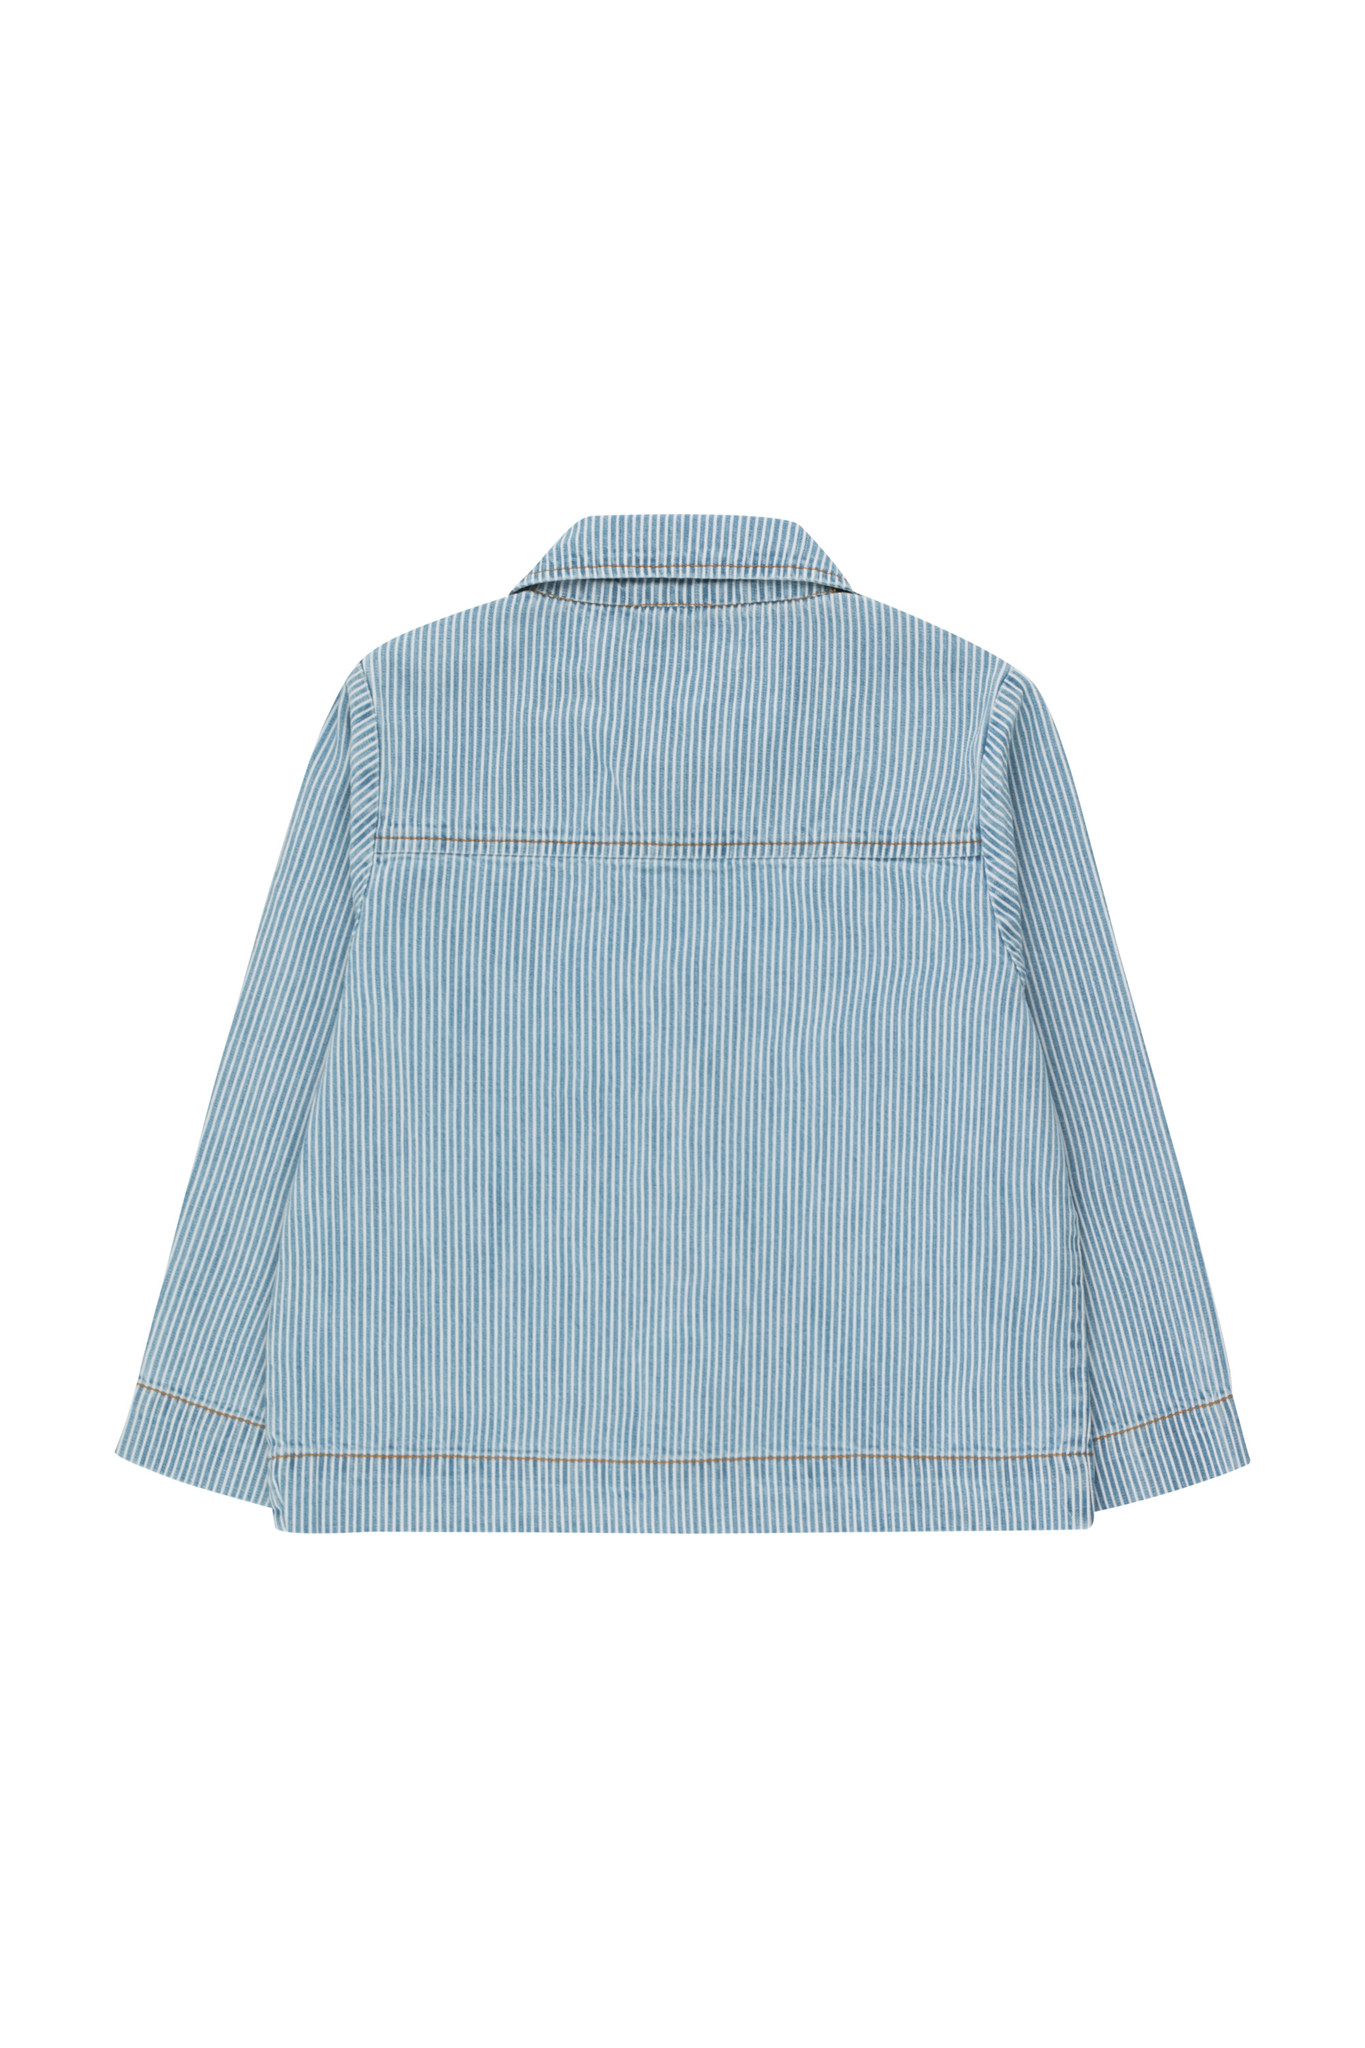 Striped denim jacket - Stripes Denim-3